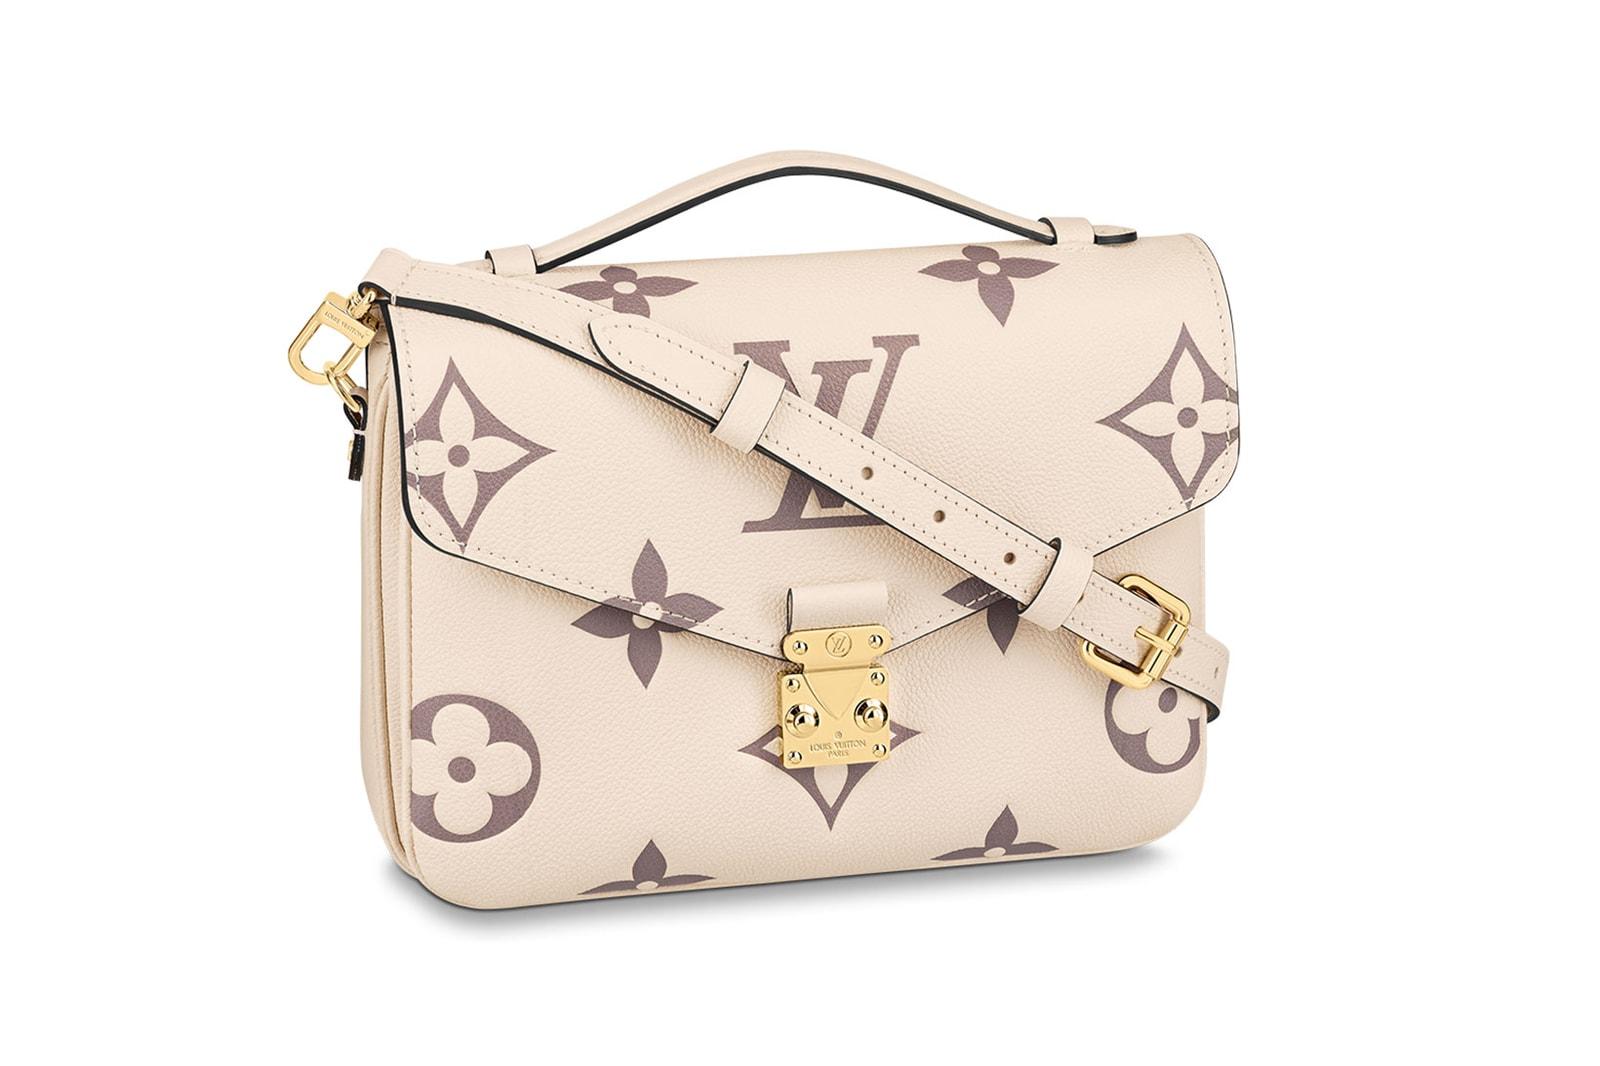 louis vuitton monogram empreinte vanity onthego mm handbags spring summer release